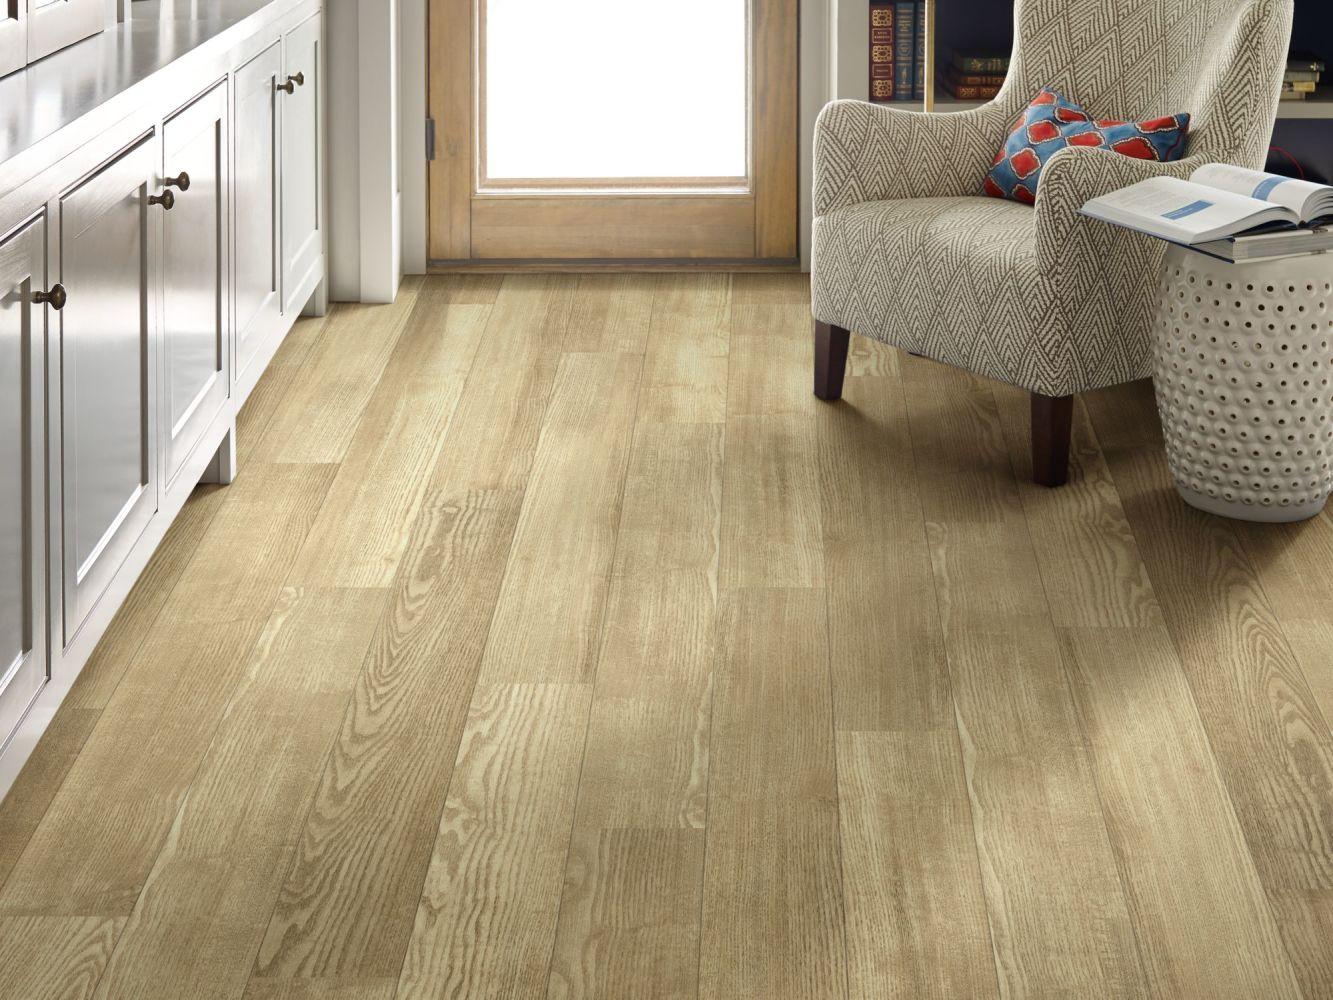 Shaw Floors 5th And Main Symbiotic 12 Sandstone 00173_5M302